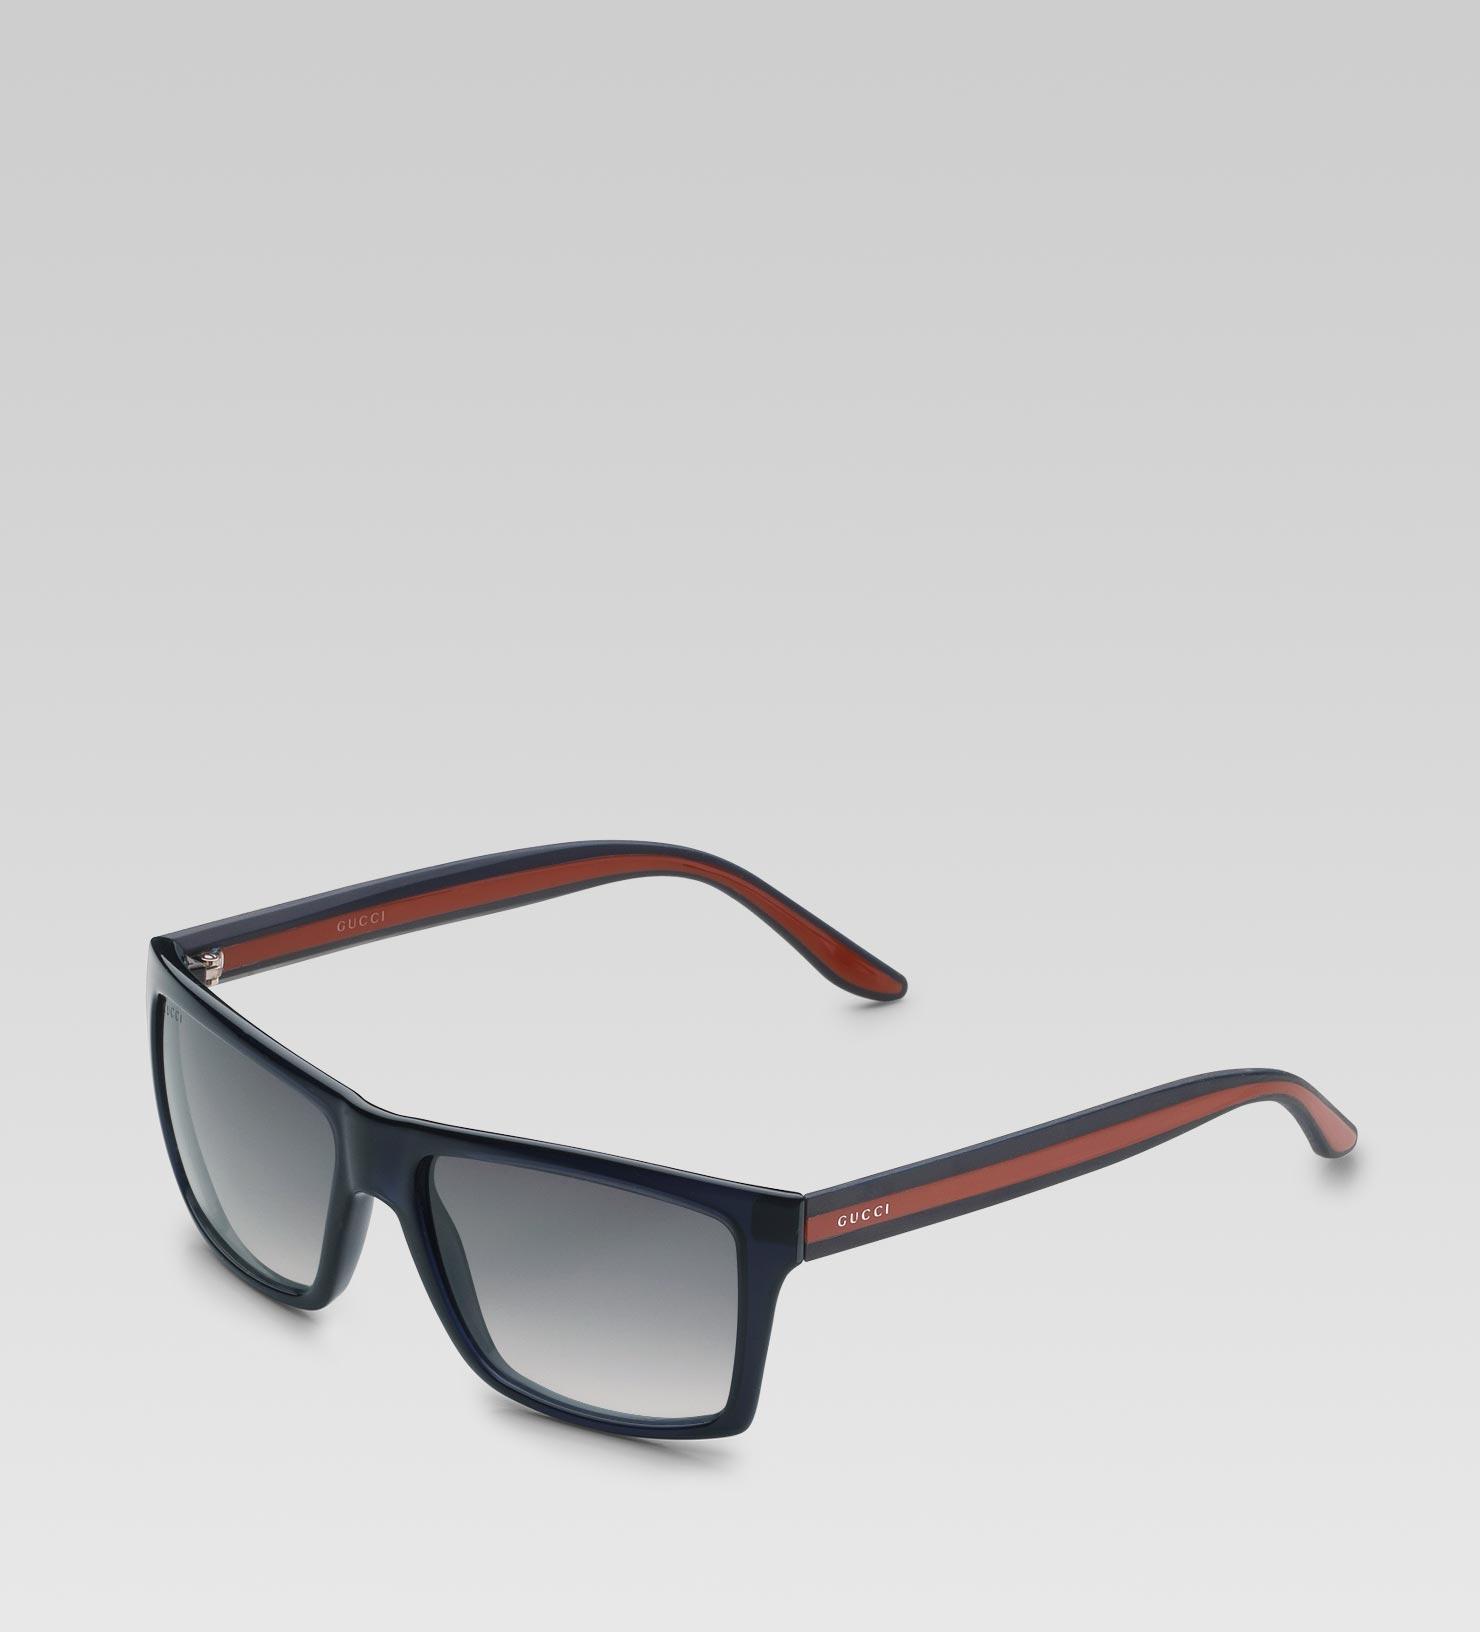 9bc648e0ac5 Lyst - Gucci Medium Rectangle Frame Sunglasses With Logo On Web ...